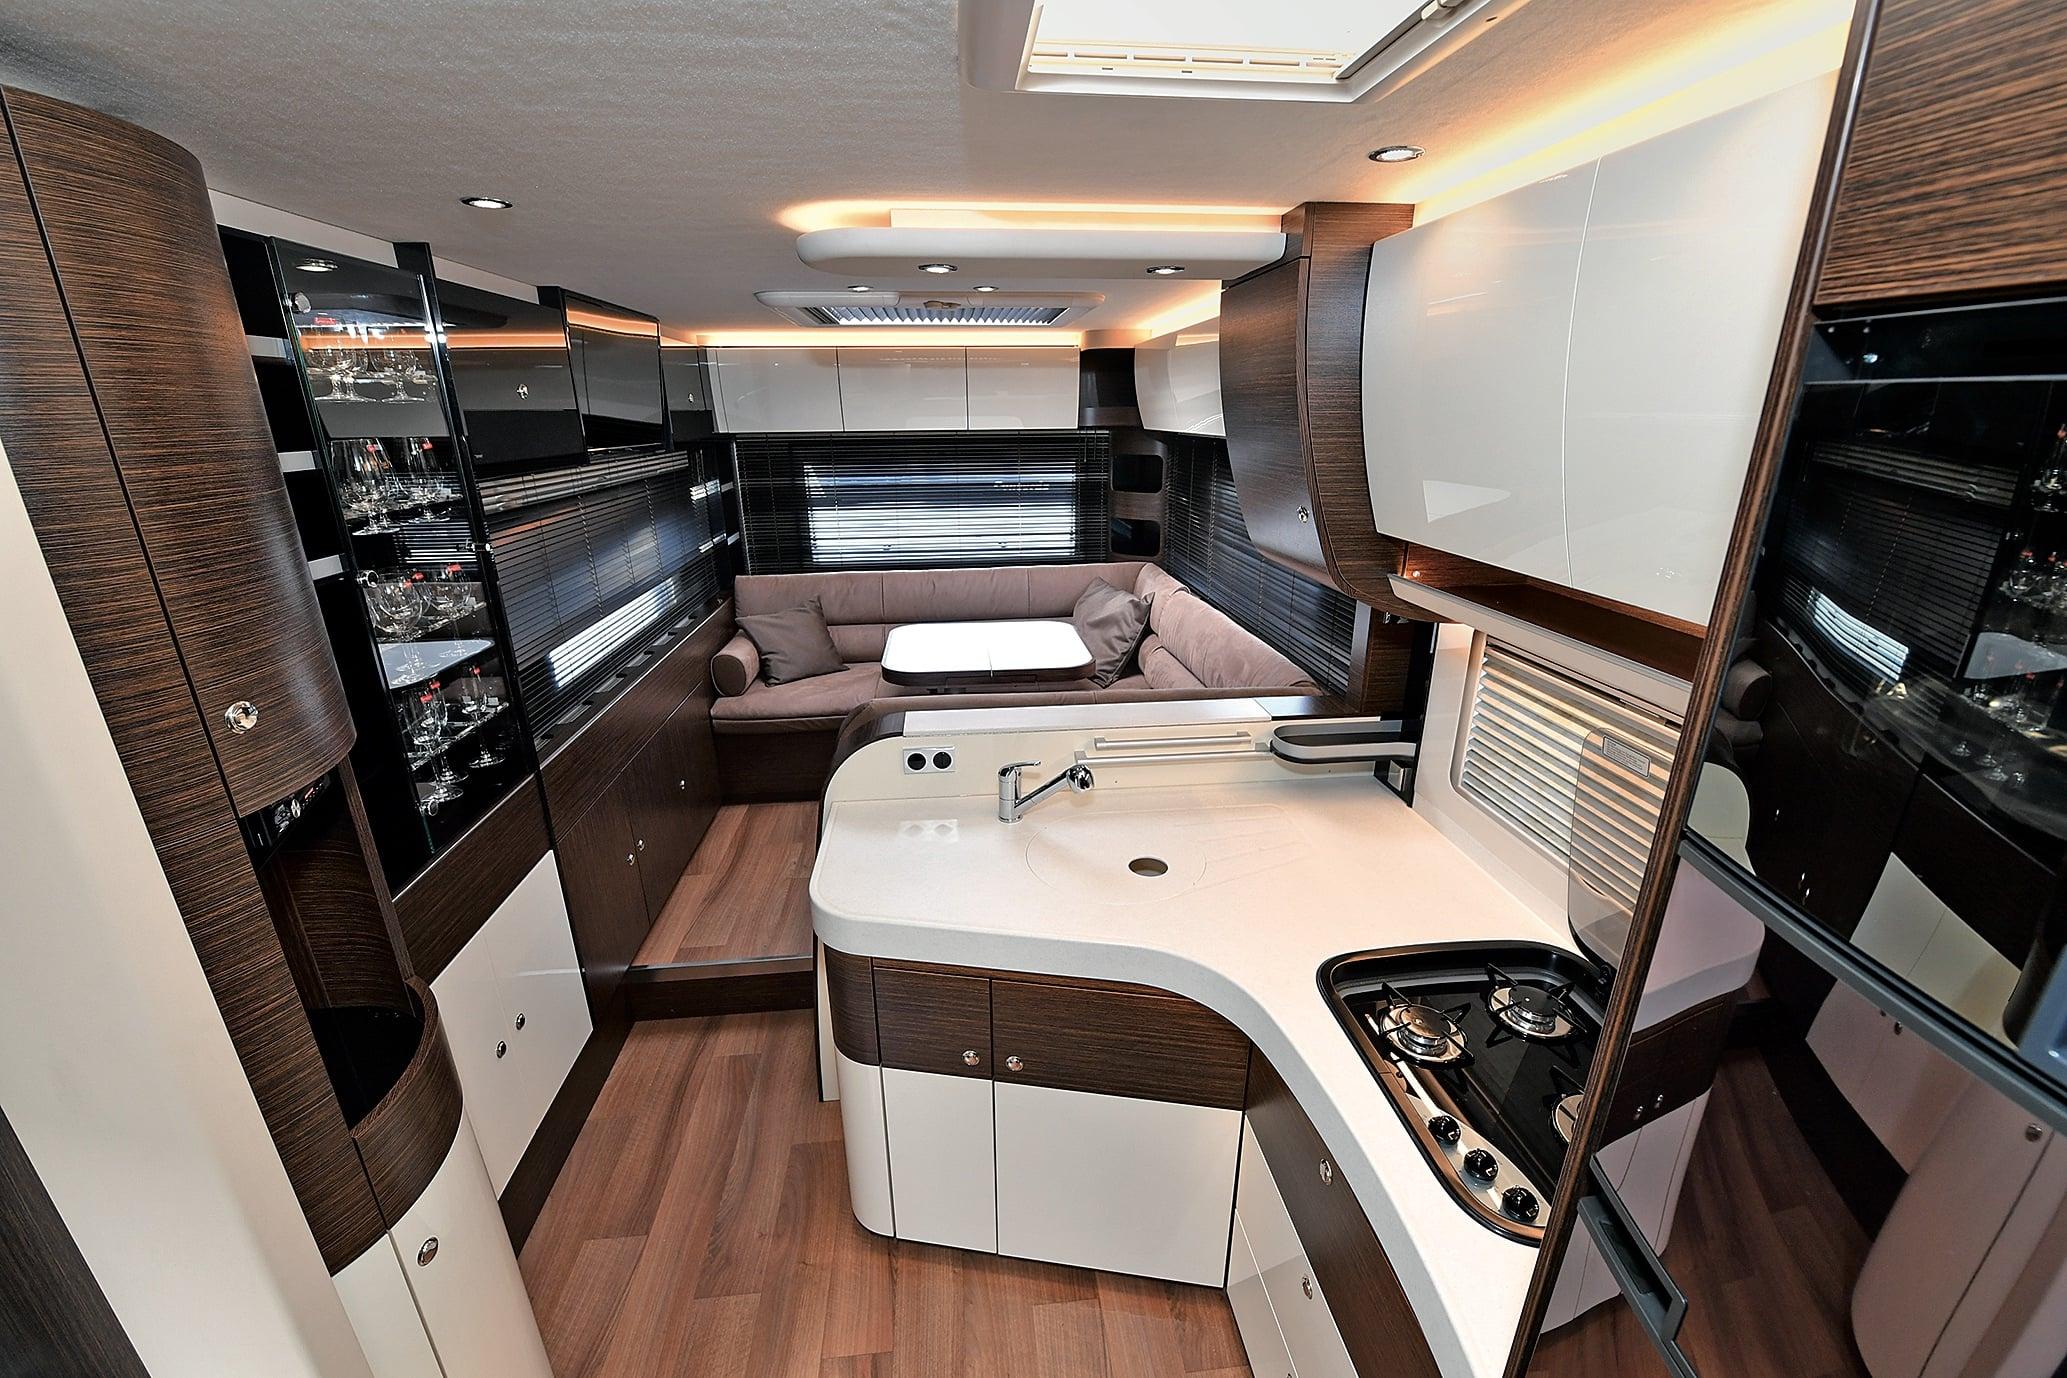 concorde carver 890 rrl reisemobil internationalreisemobil international. Black Bedroom Furniture Sets. Home Design Ideas